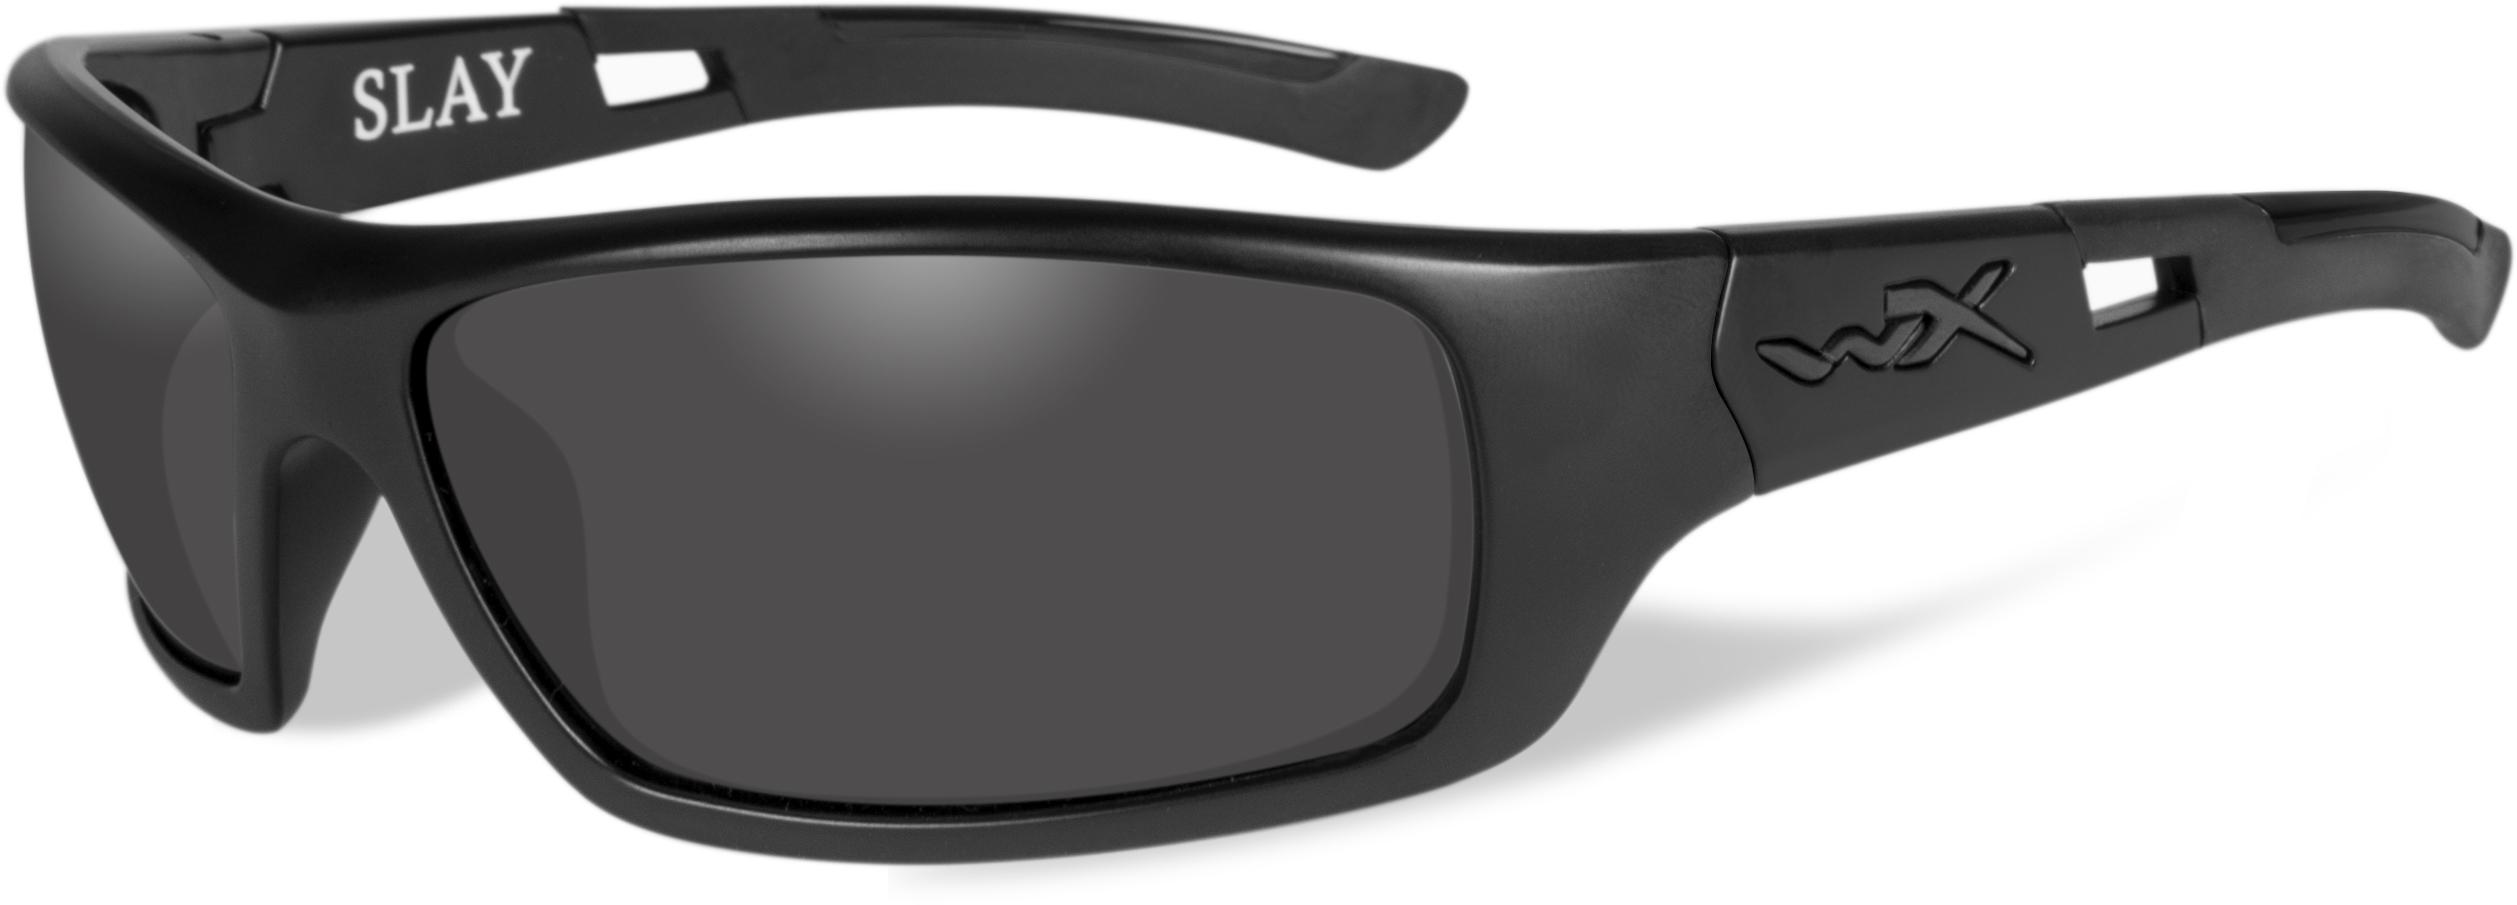 9f3d60aa77 Wiley X Black Ops Slay Tactical Sunglasses